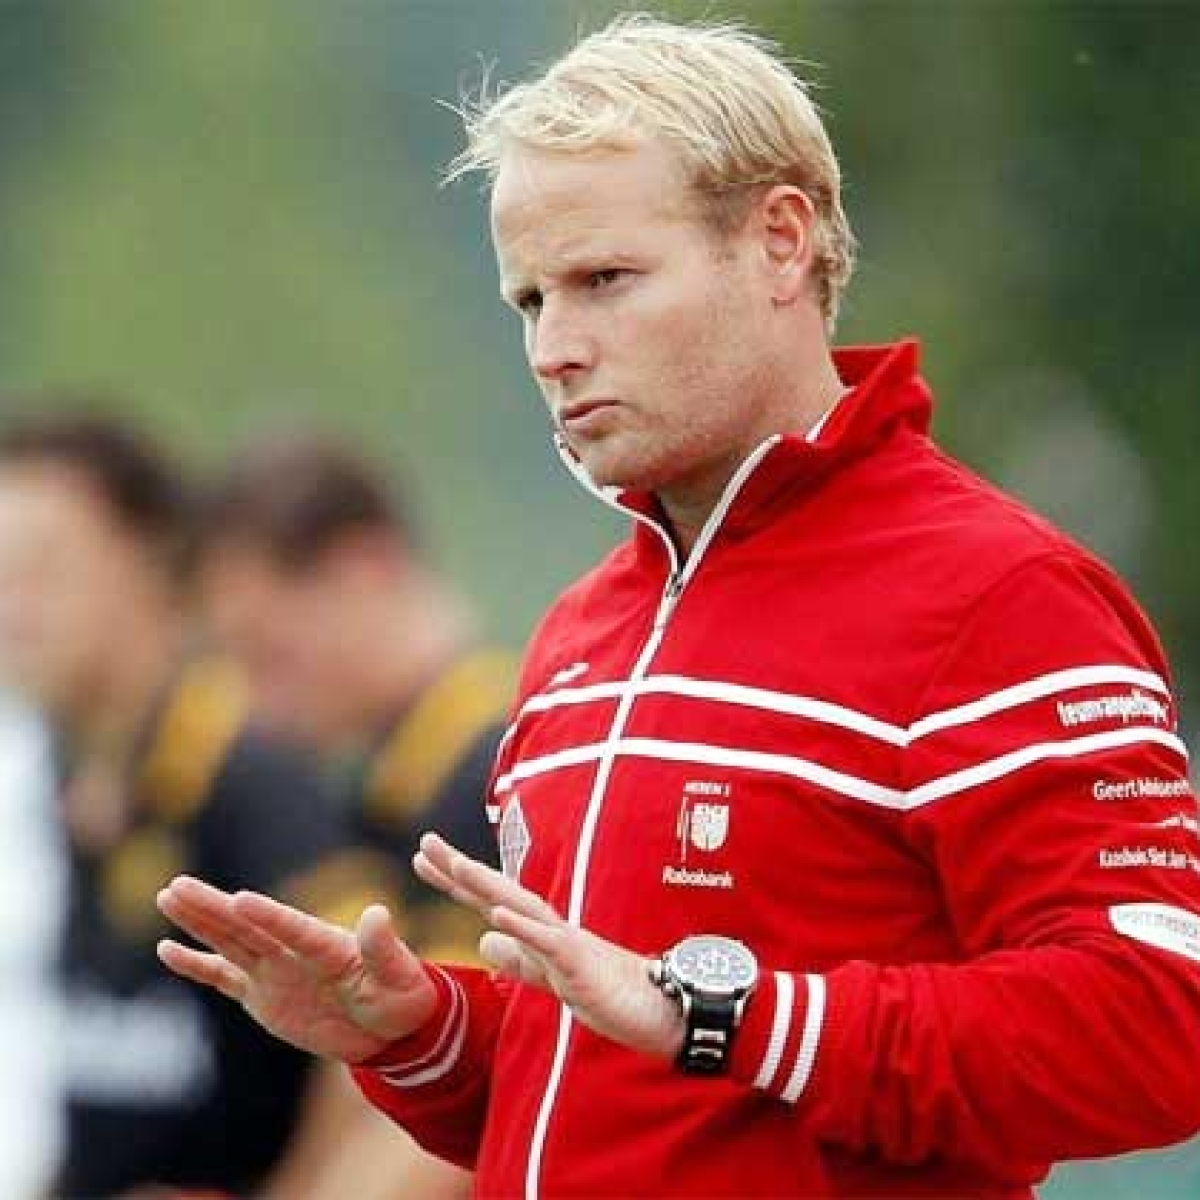 Playing Olympic Qualifiers at home huge boost: Sjoerd Marijne